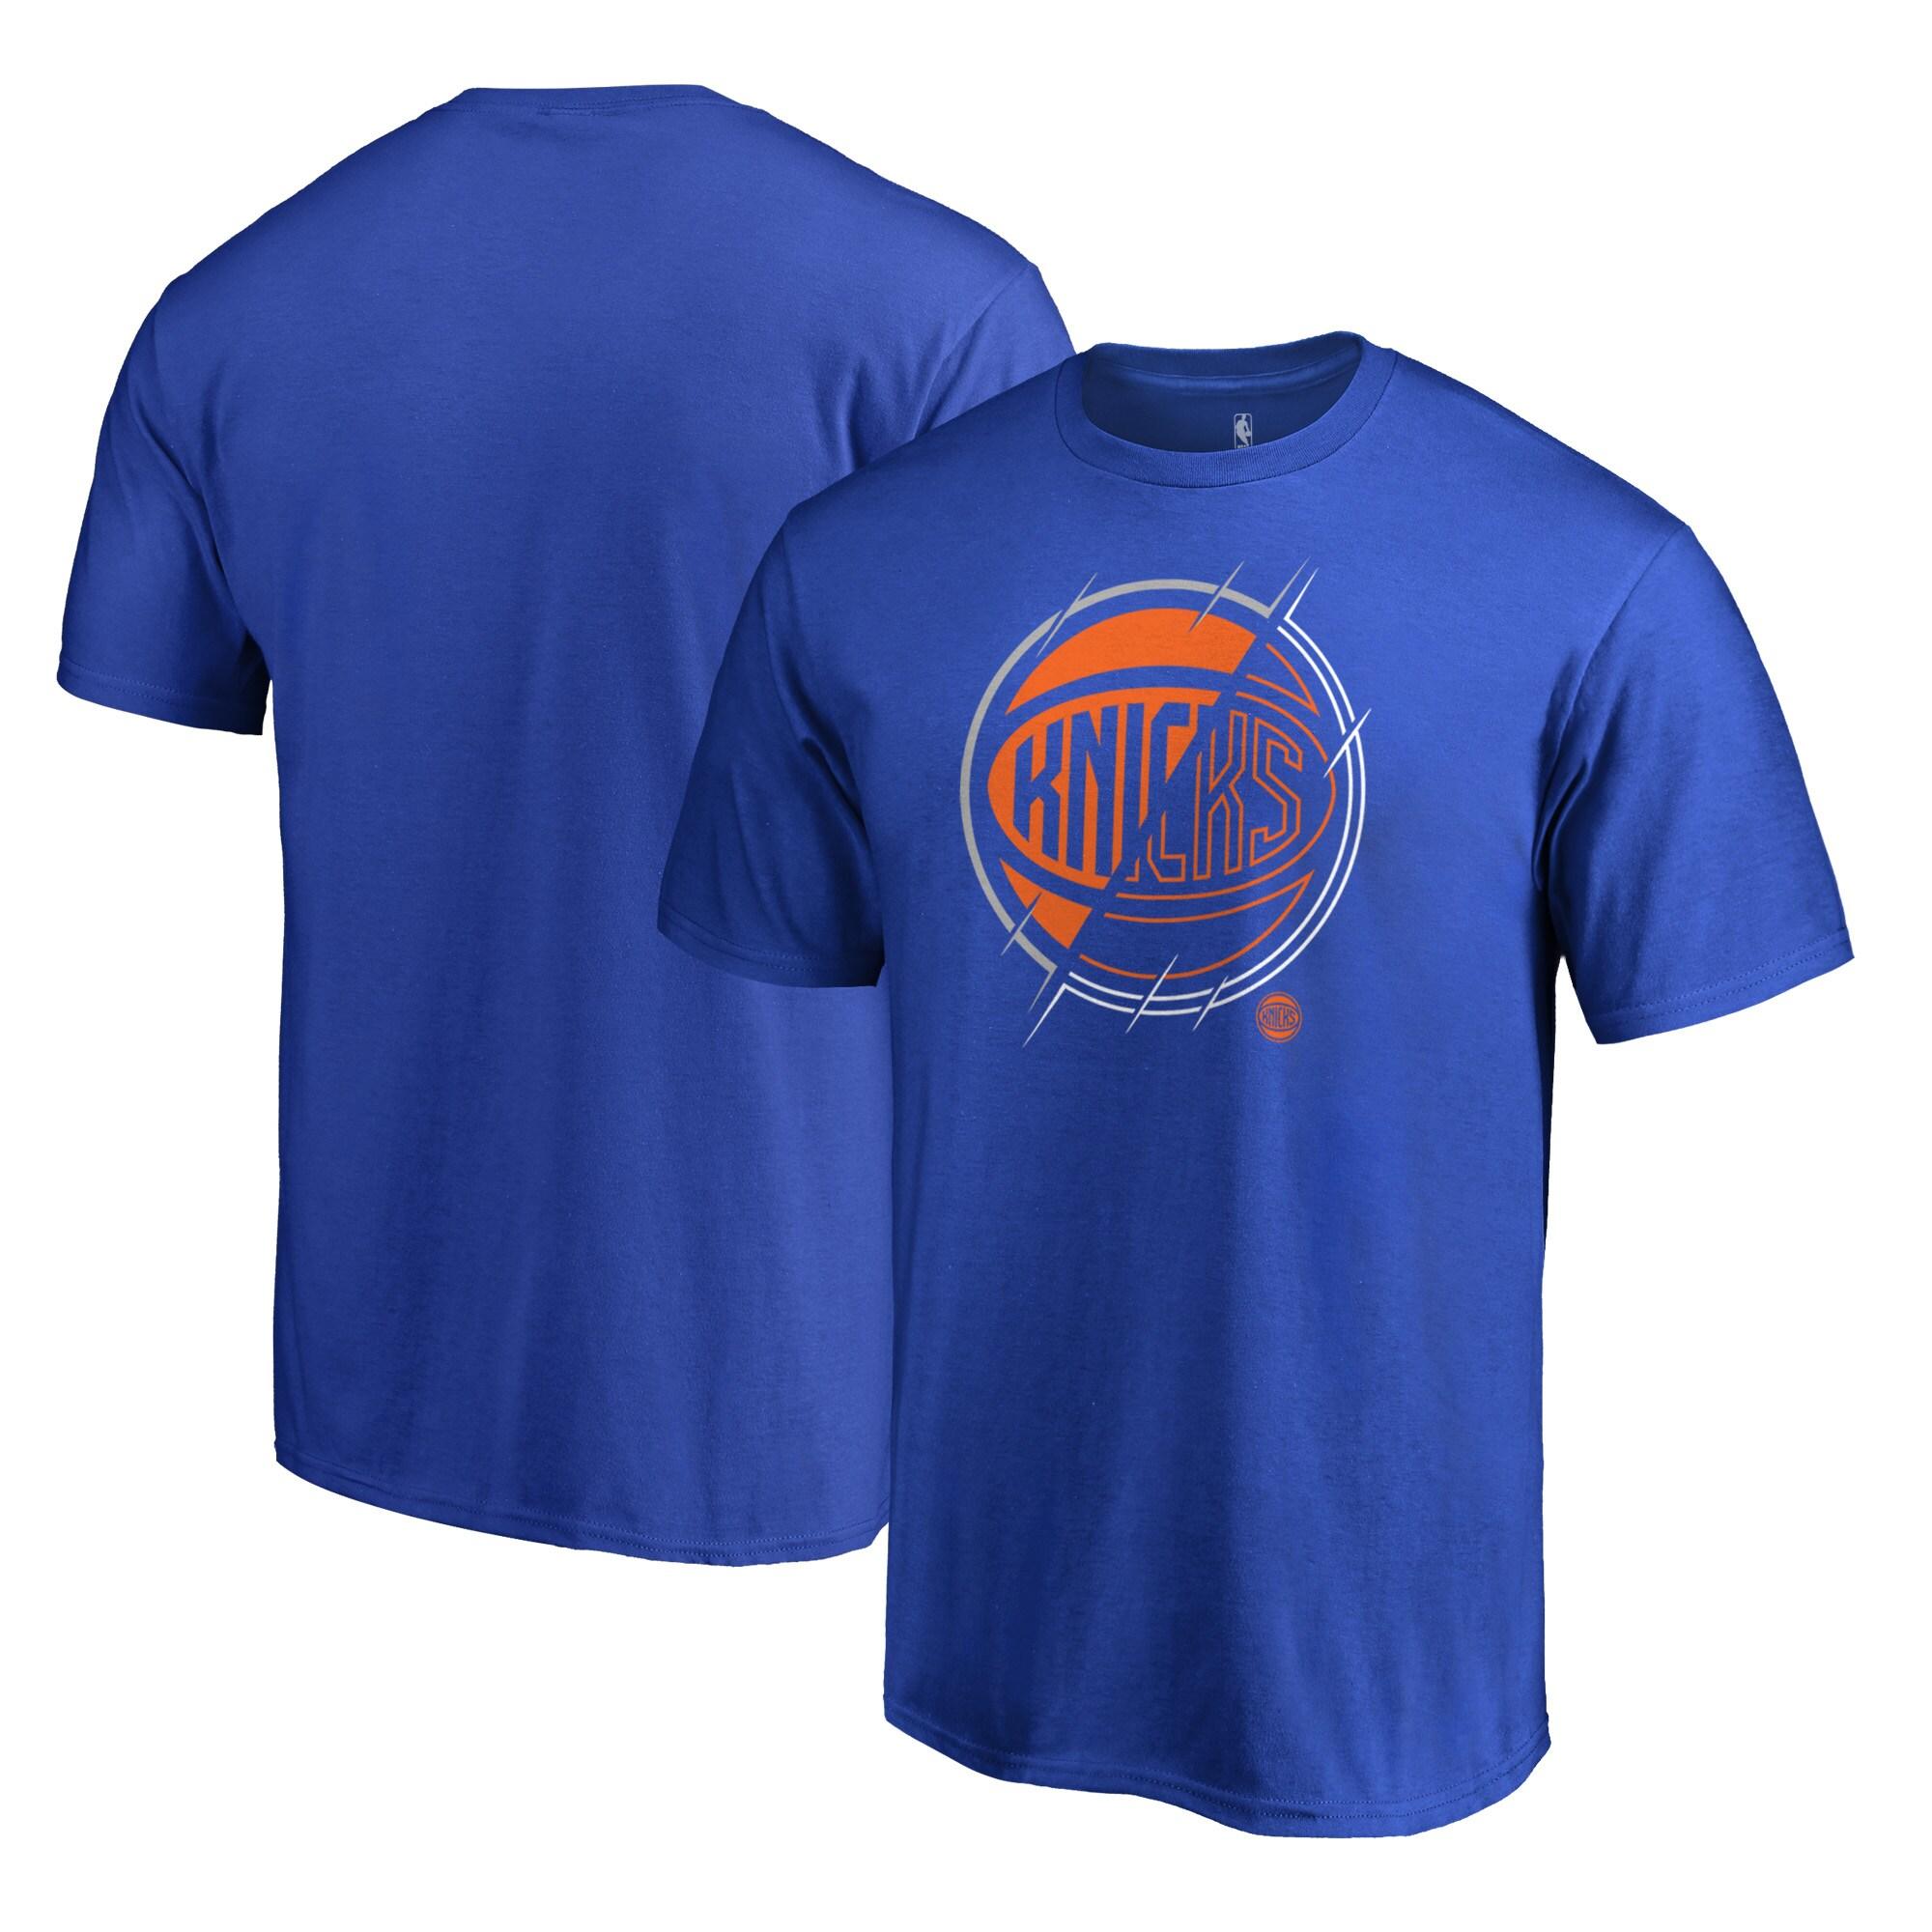 New York Knicks Fanatics Branded X-Ray T-Shirt - Royal